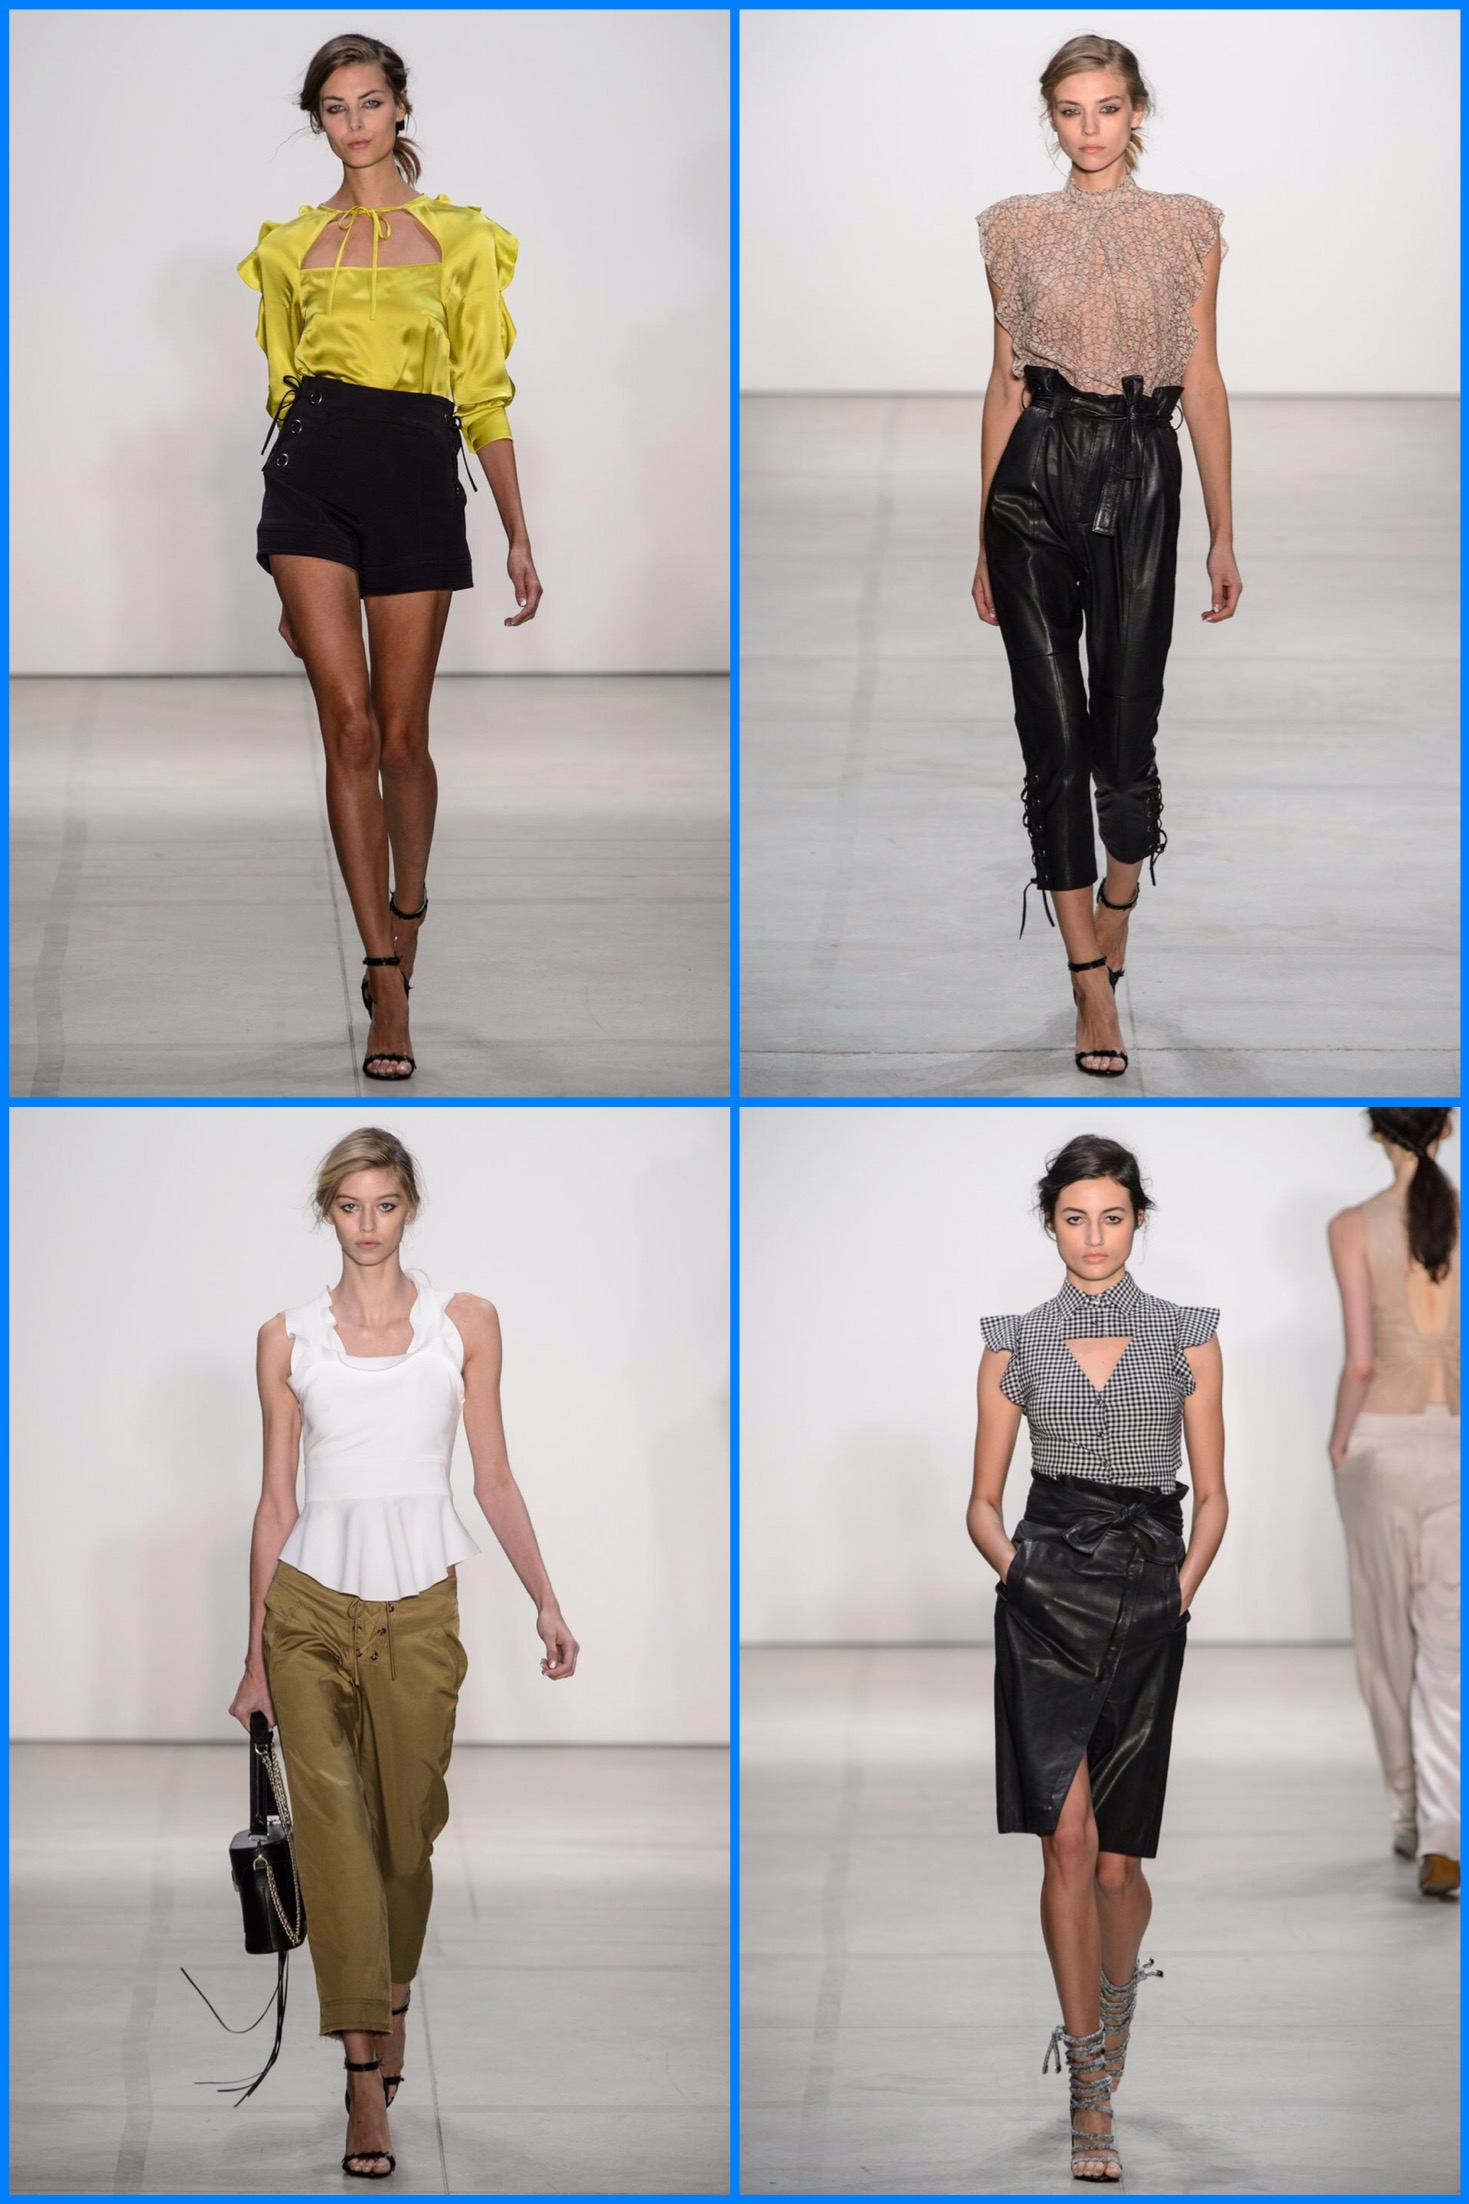 new-york-fashion-week-pret-a-porter-spring-summer-2017-style-marissa-webb